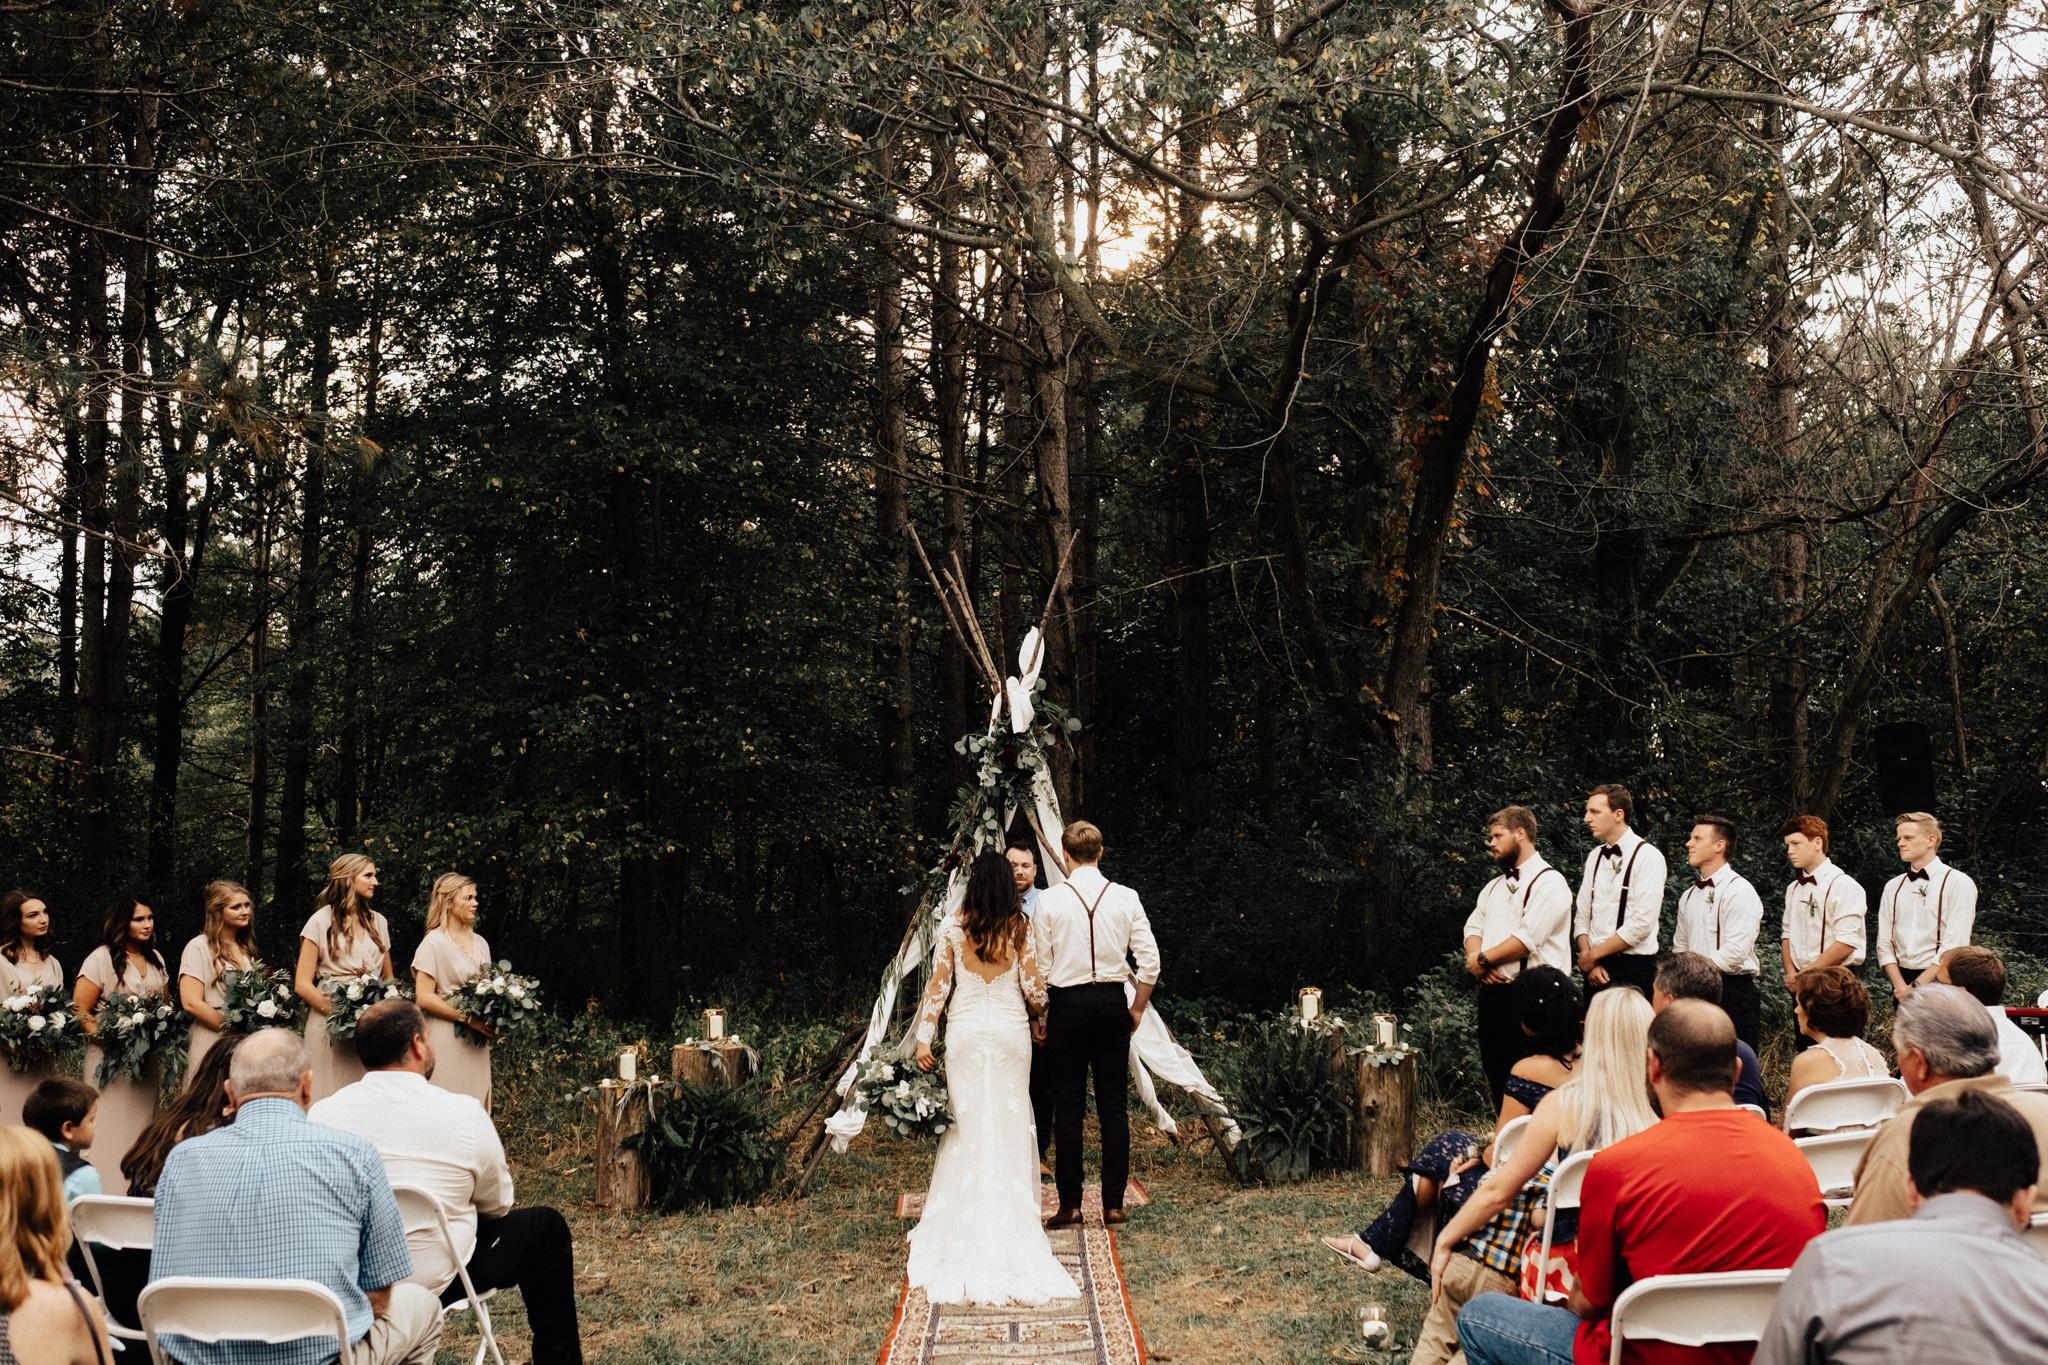 Arizona-Adventure-Elopement-Wedding-Photographer-125.jpg